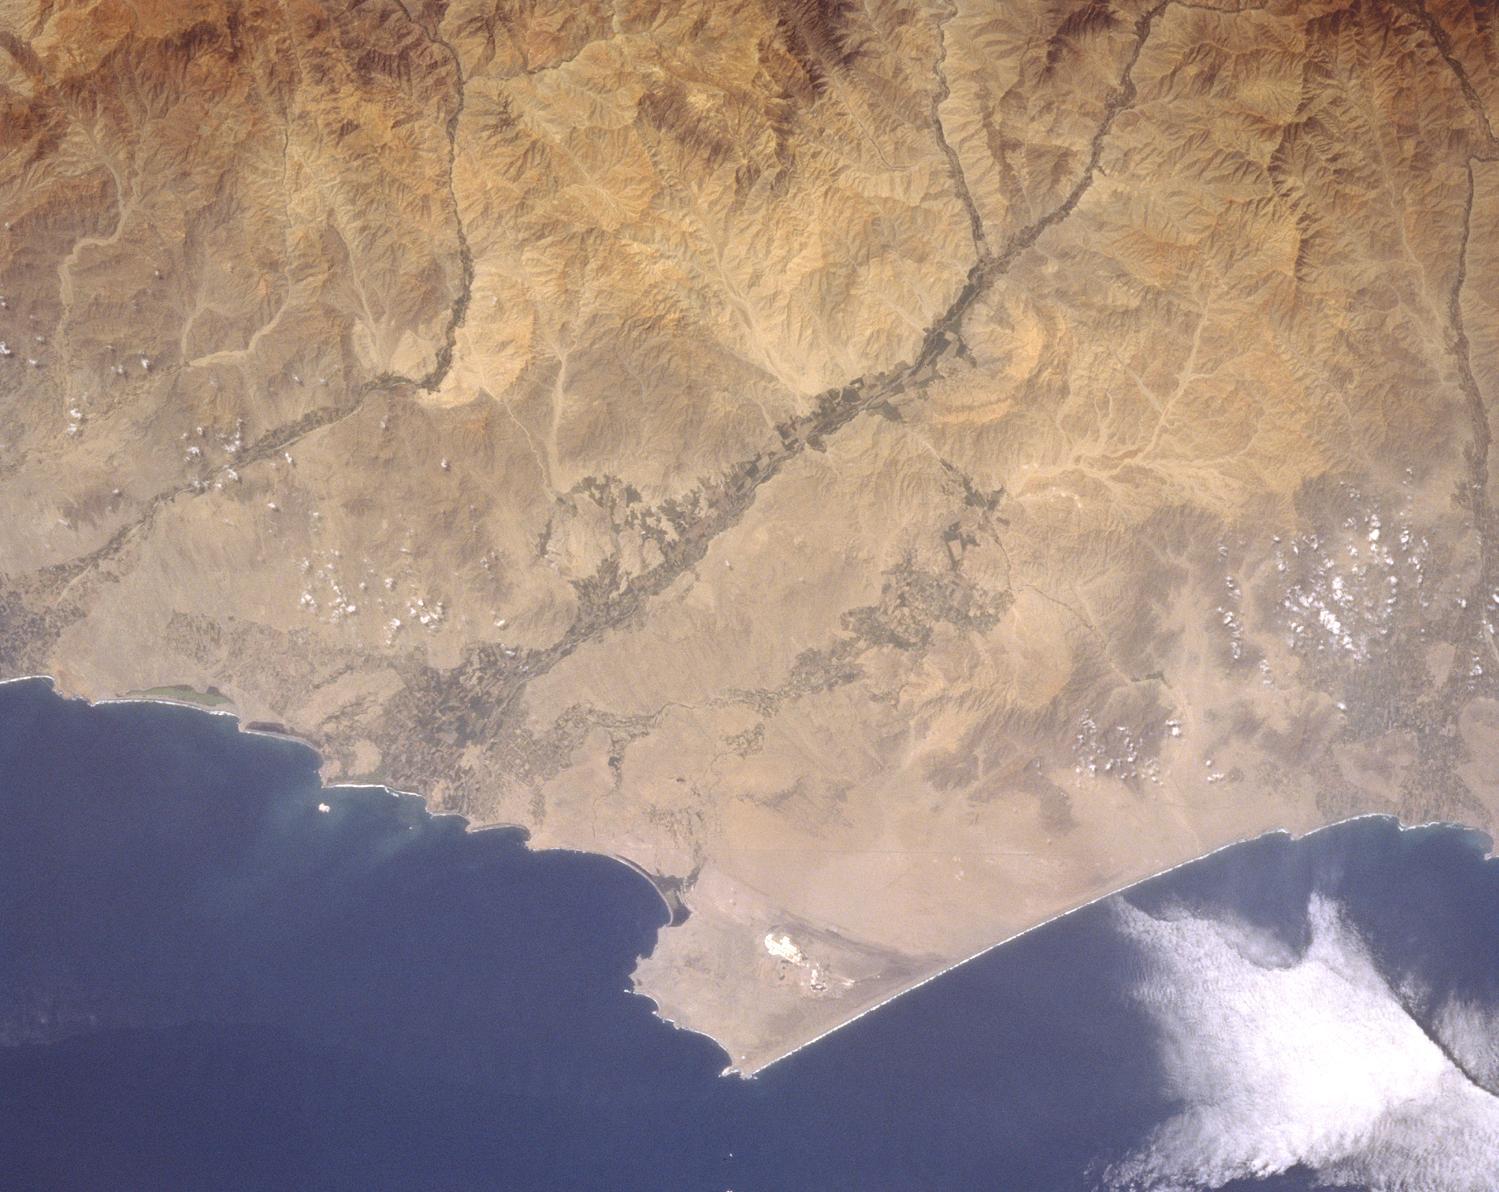 Imagen, Foto Satelite del Area de Huacho, Peru